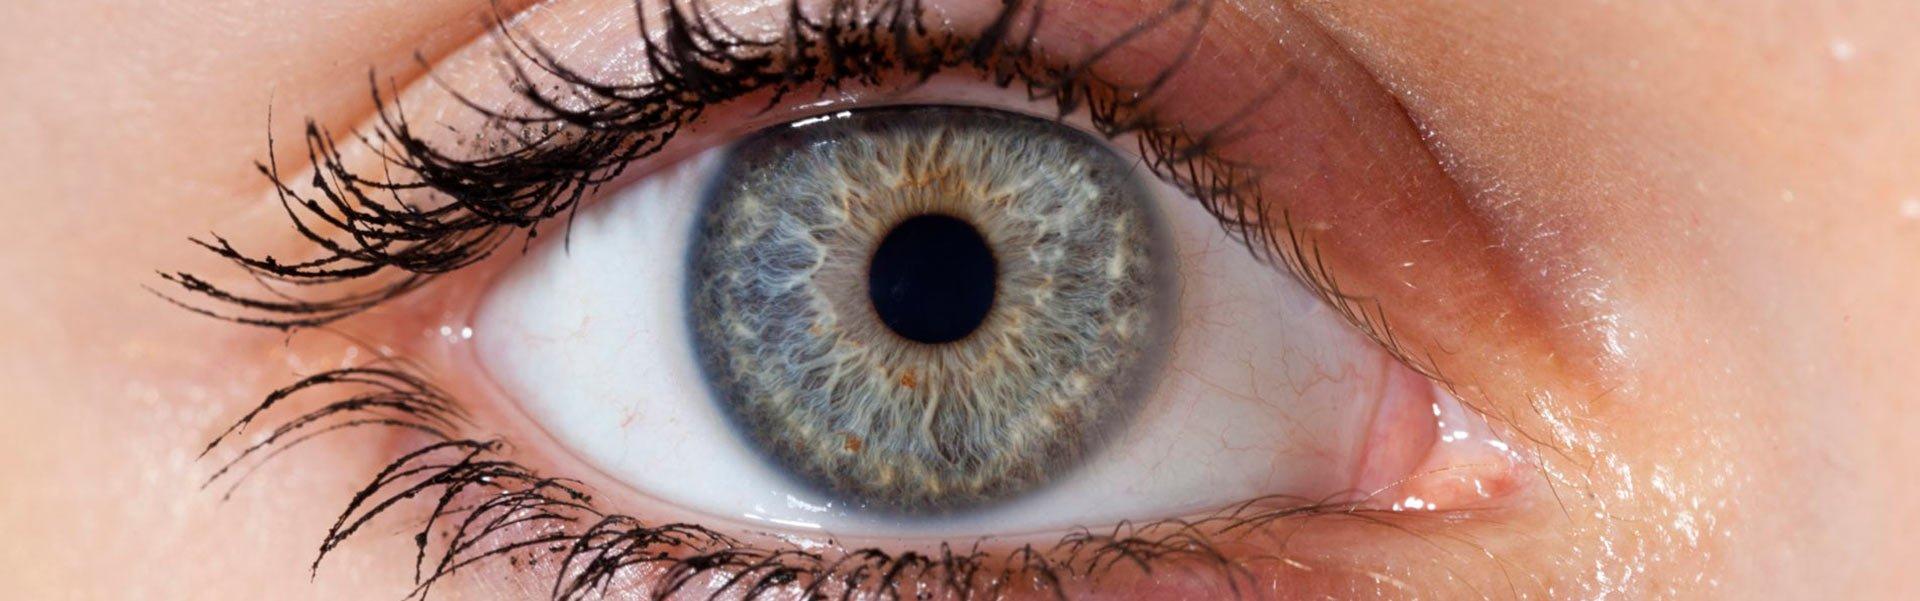 irisdiagnose-naturheilpraxis-luzern